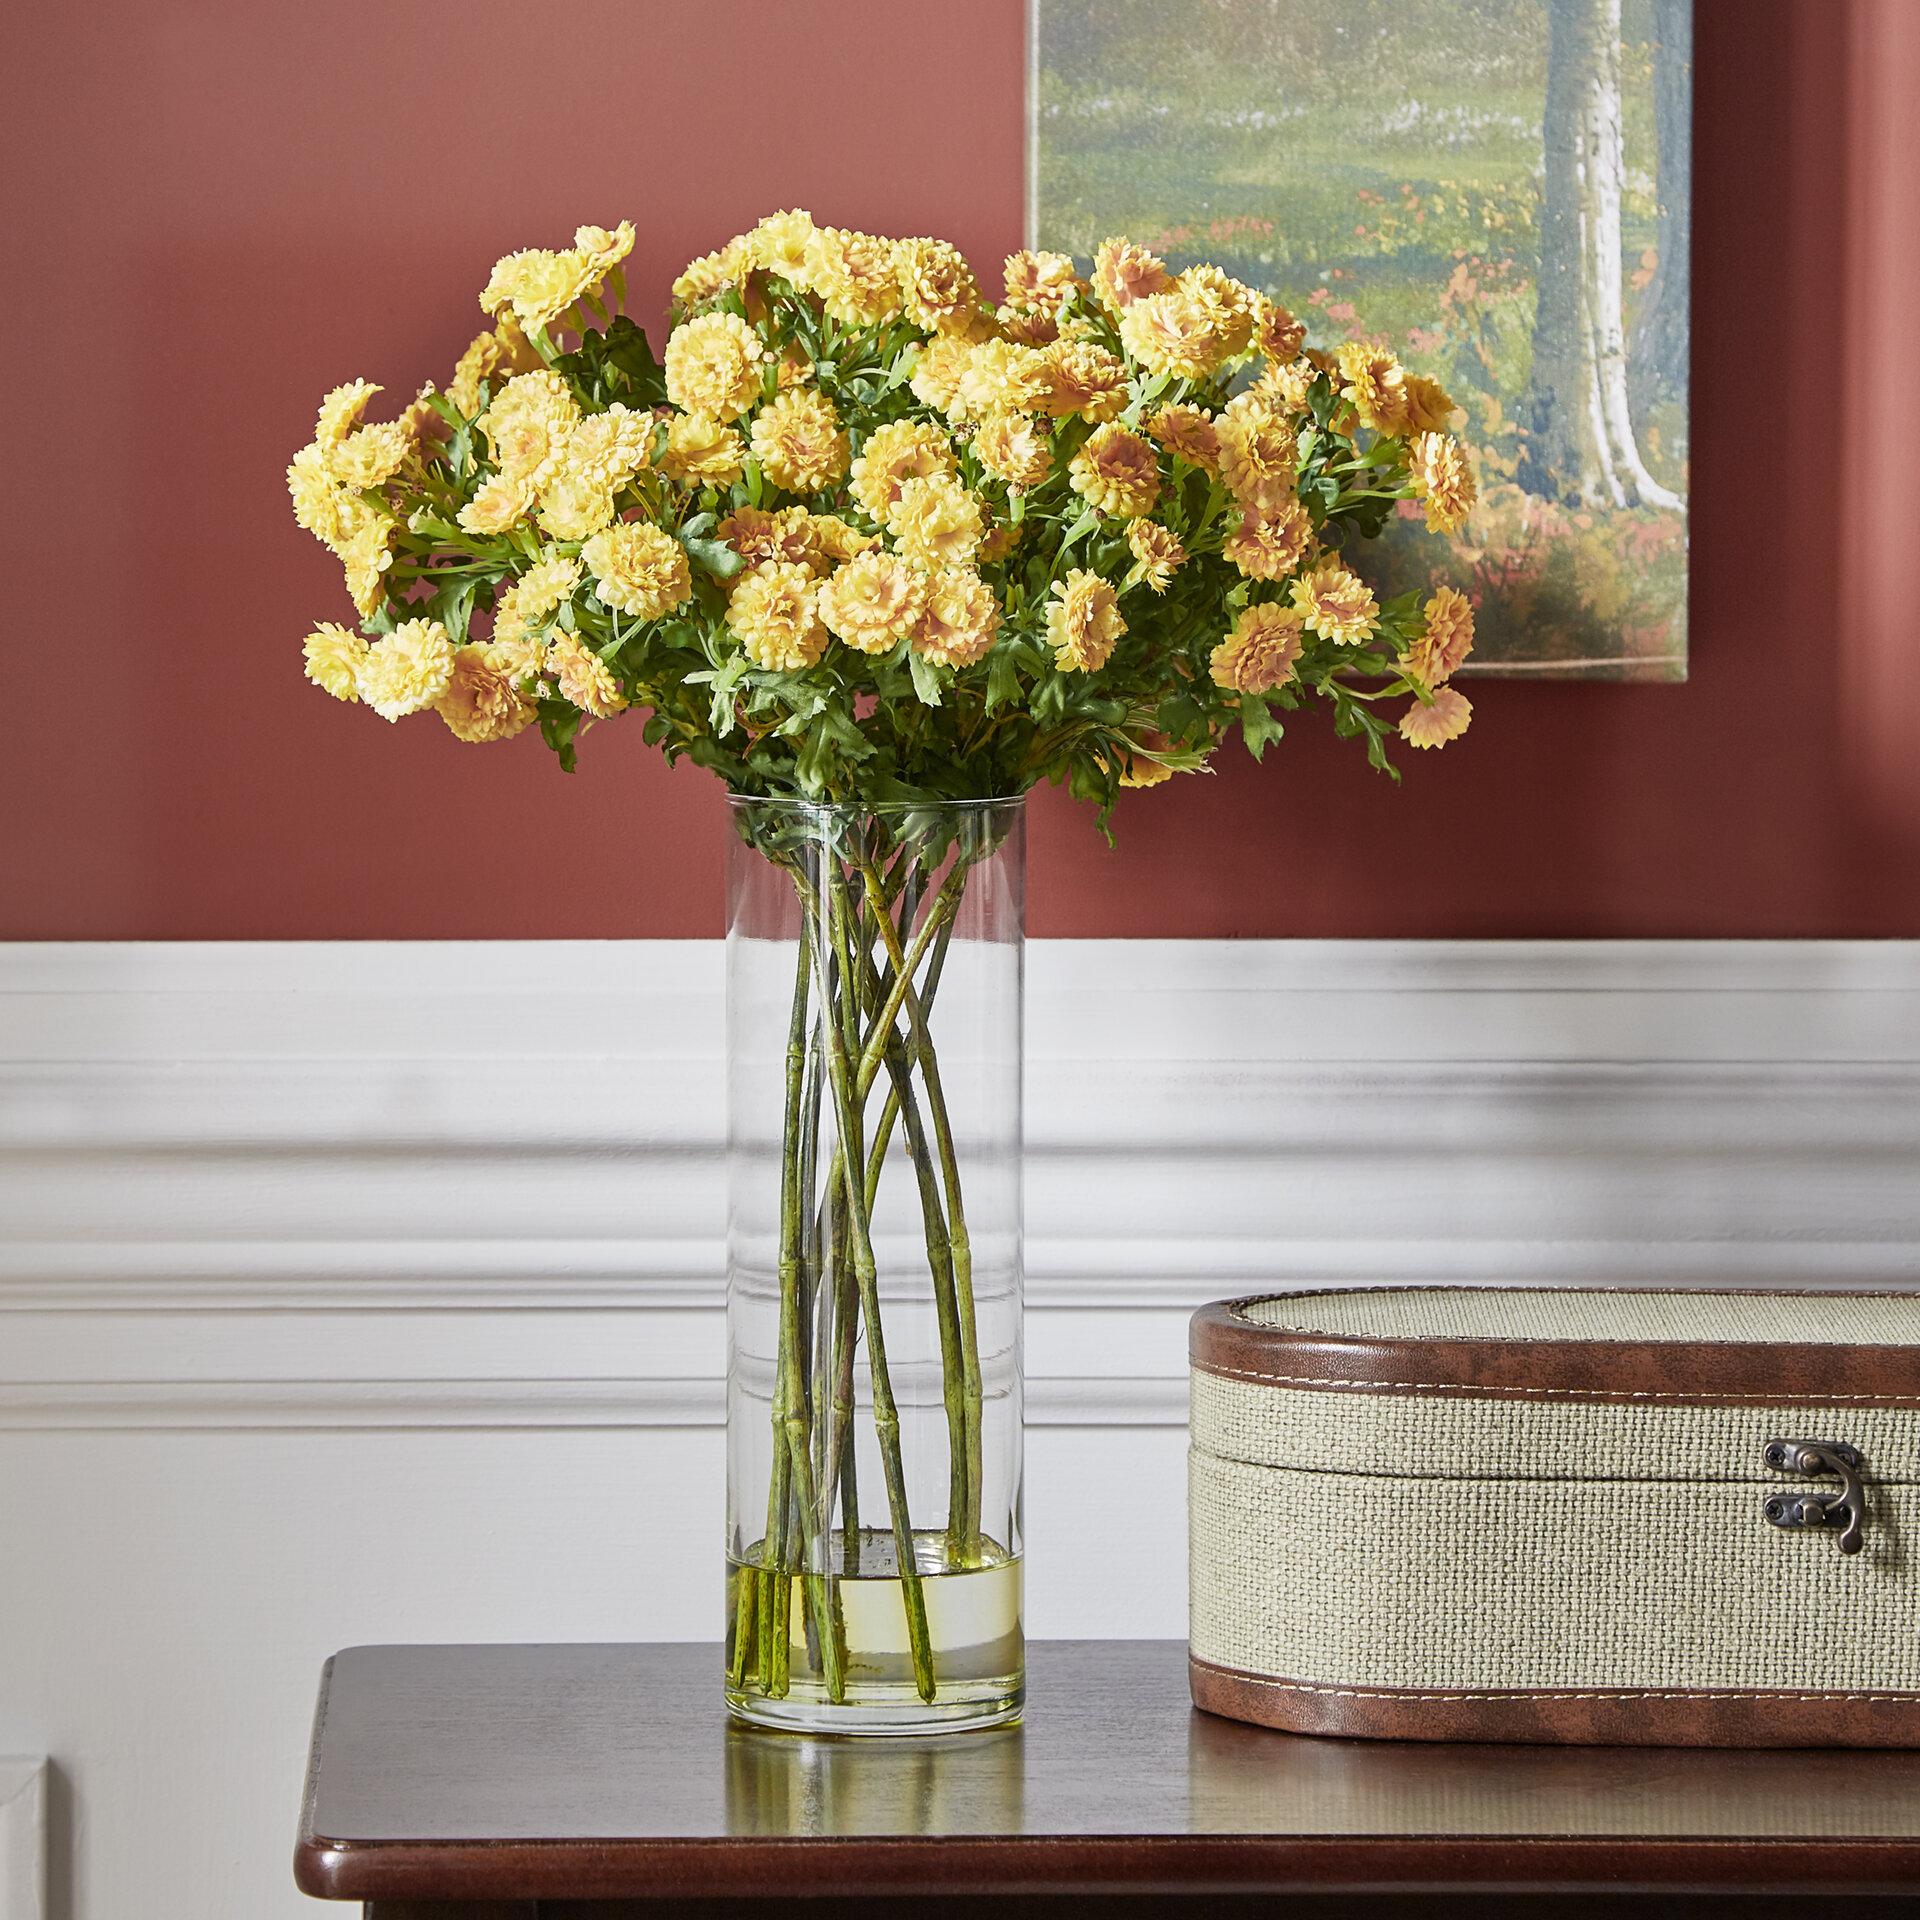 Home Decor Floral Table Japanese Yellow Silk Flower Arrangement Tall Glass Vase